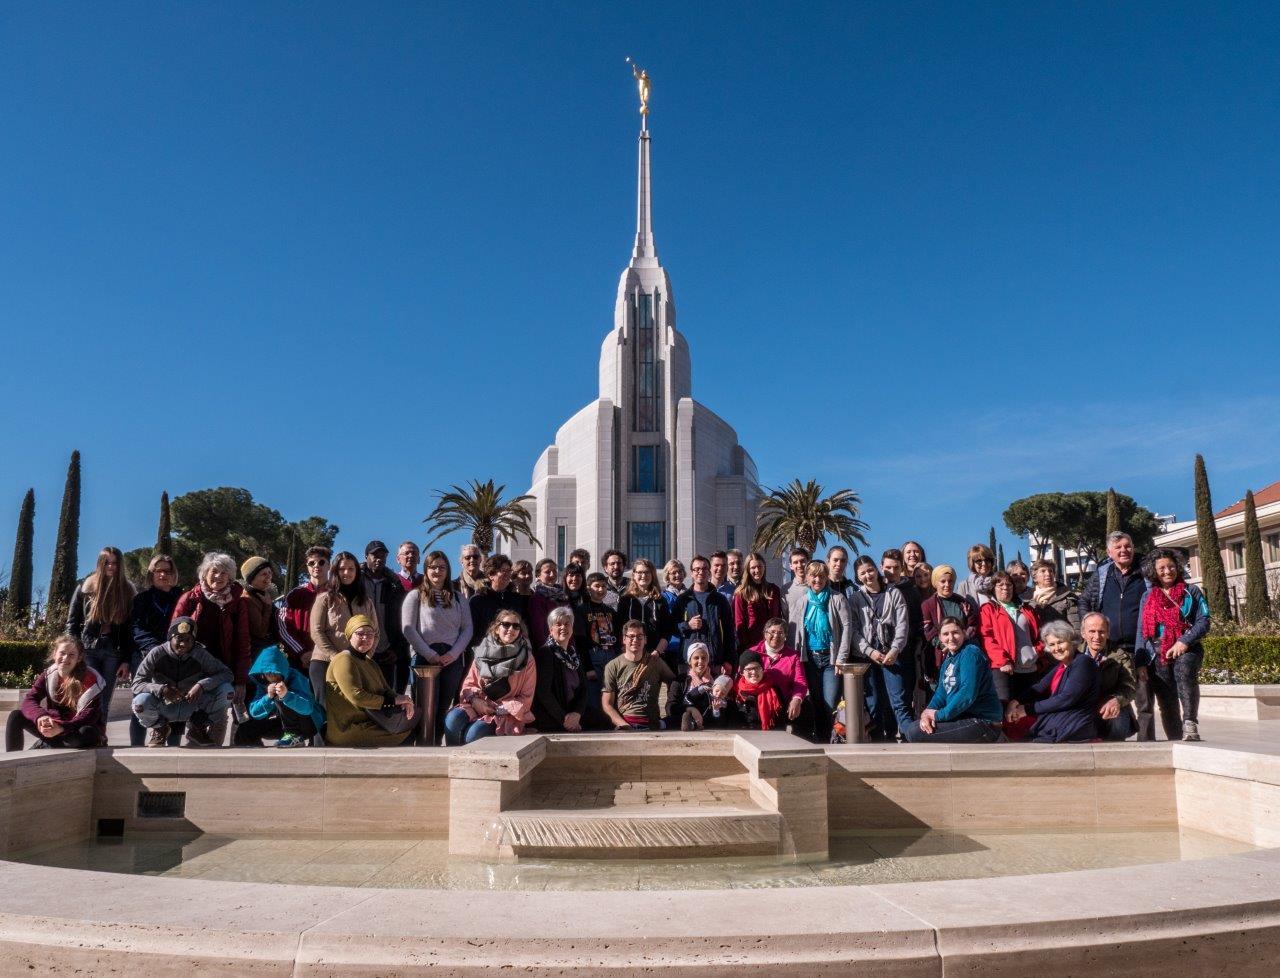 Romfahrt 2019 – Besuch des Tempels der Kirche Jesu Christi HLT